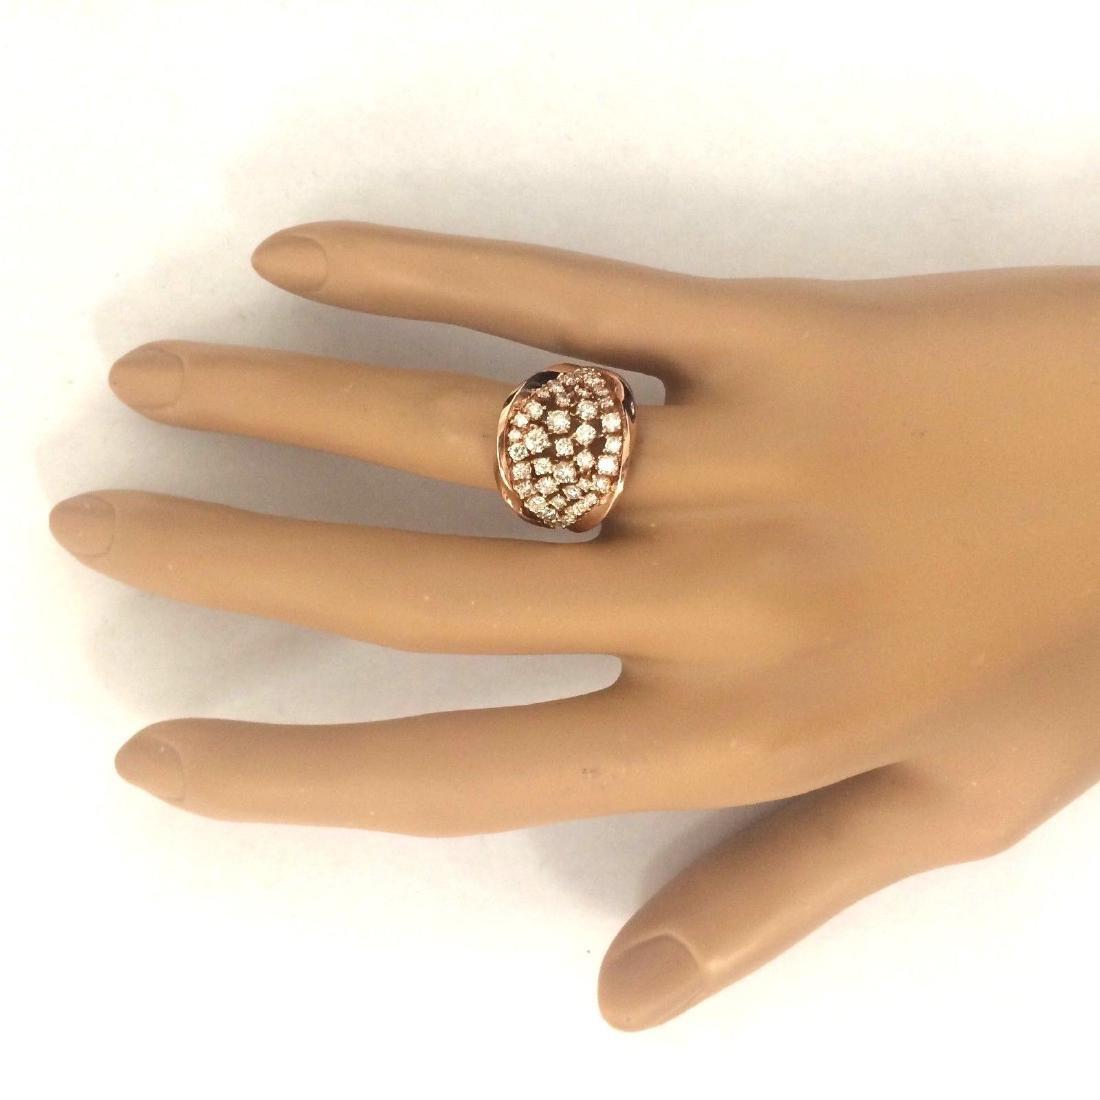 1.40 Carat Natural Diamond 18K Solid Rose Gold Ring - 6